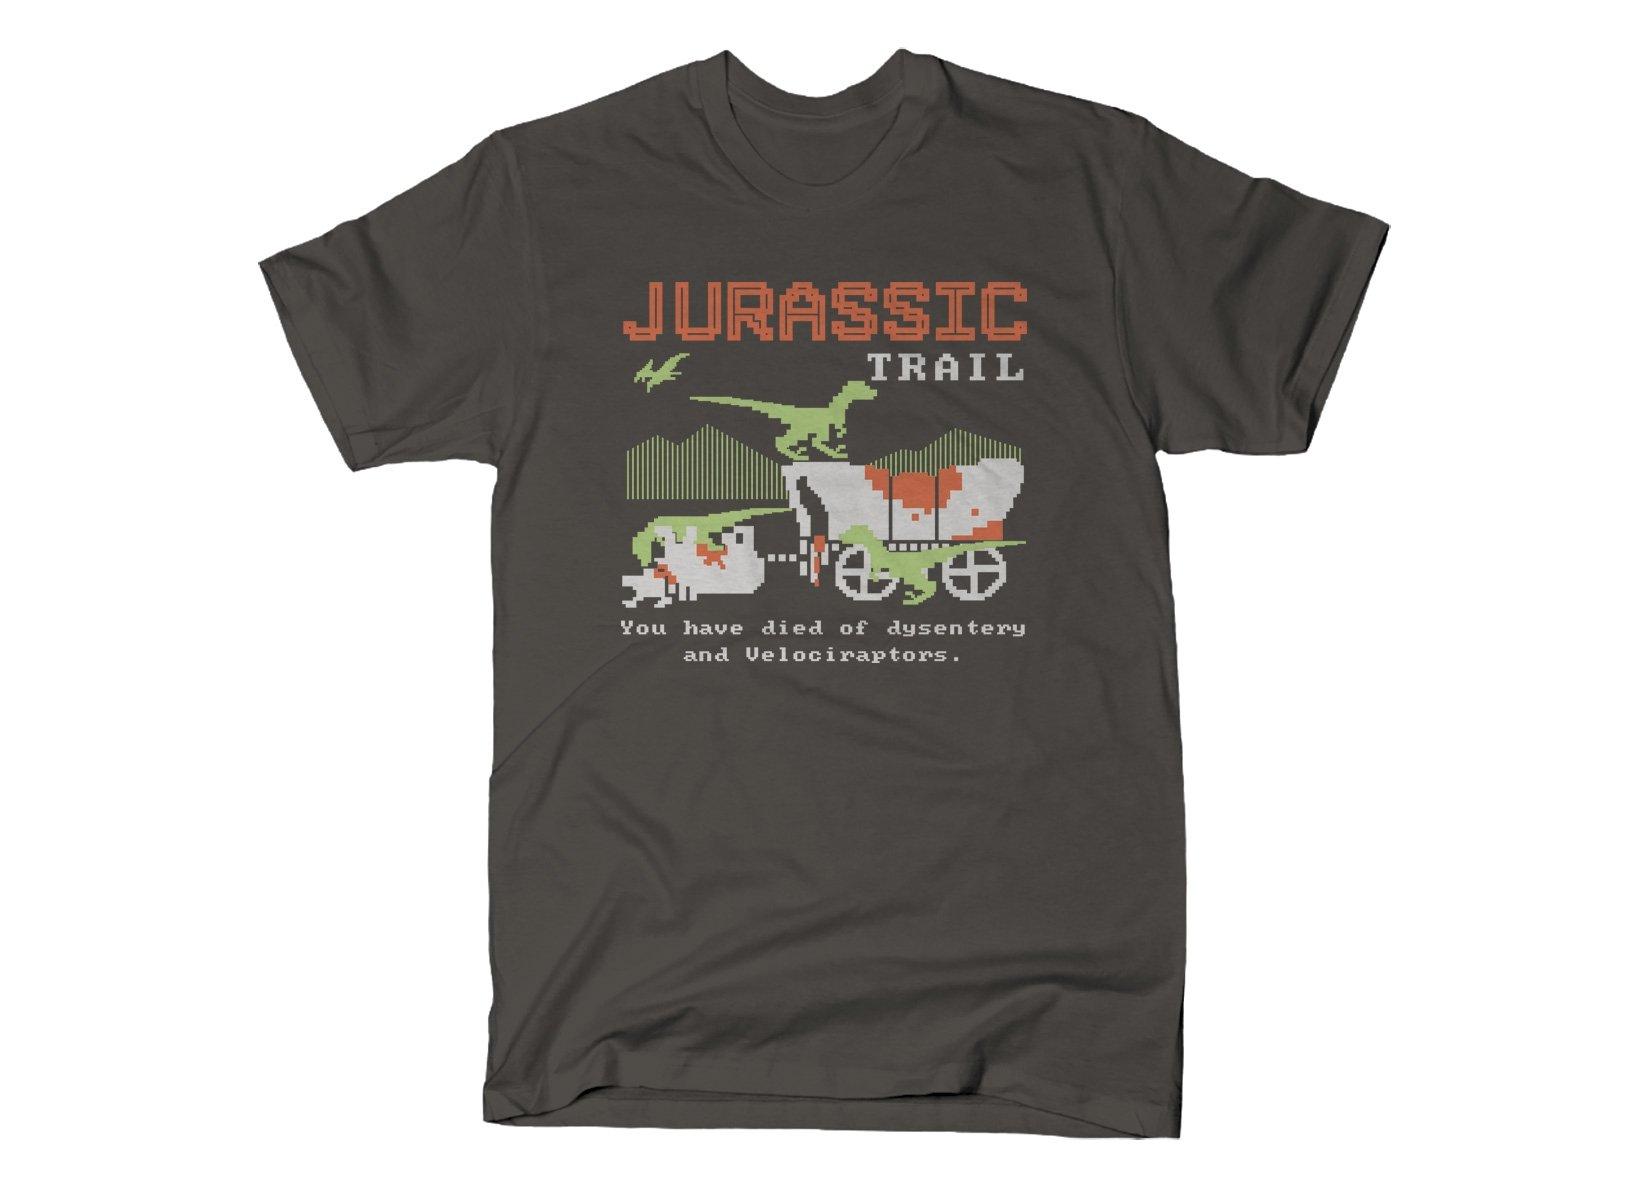 Jurassic Trail on Mens T-Shirt